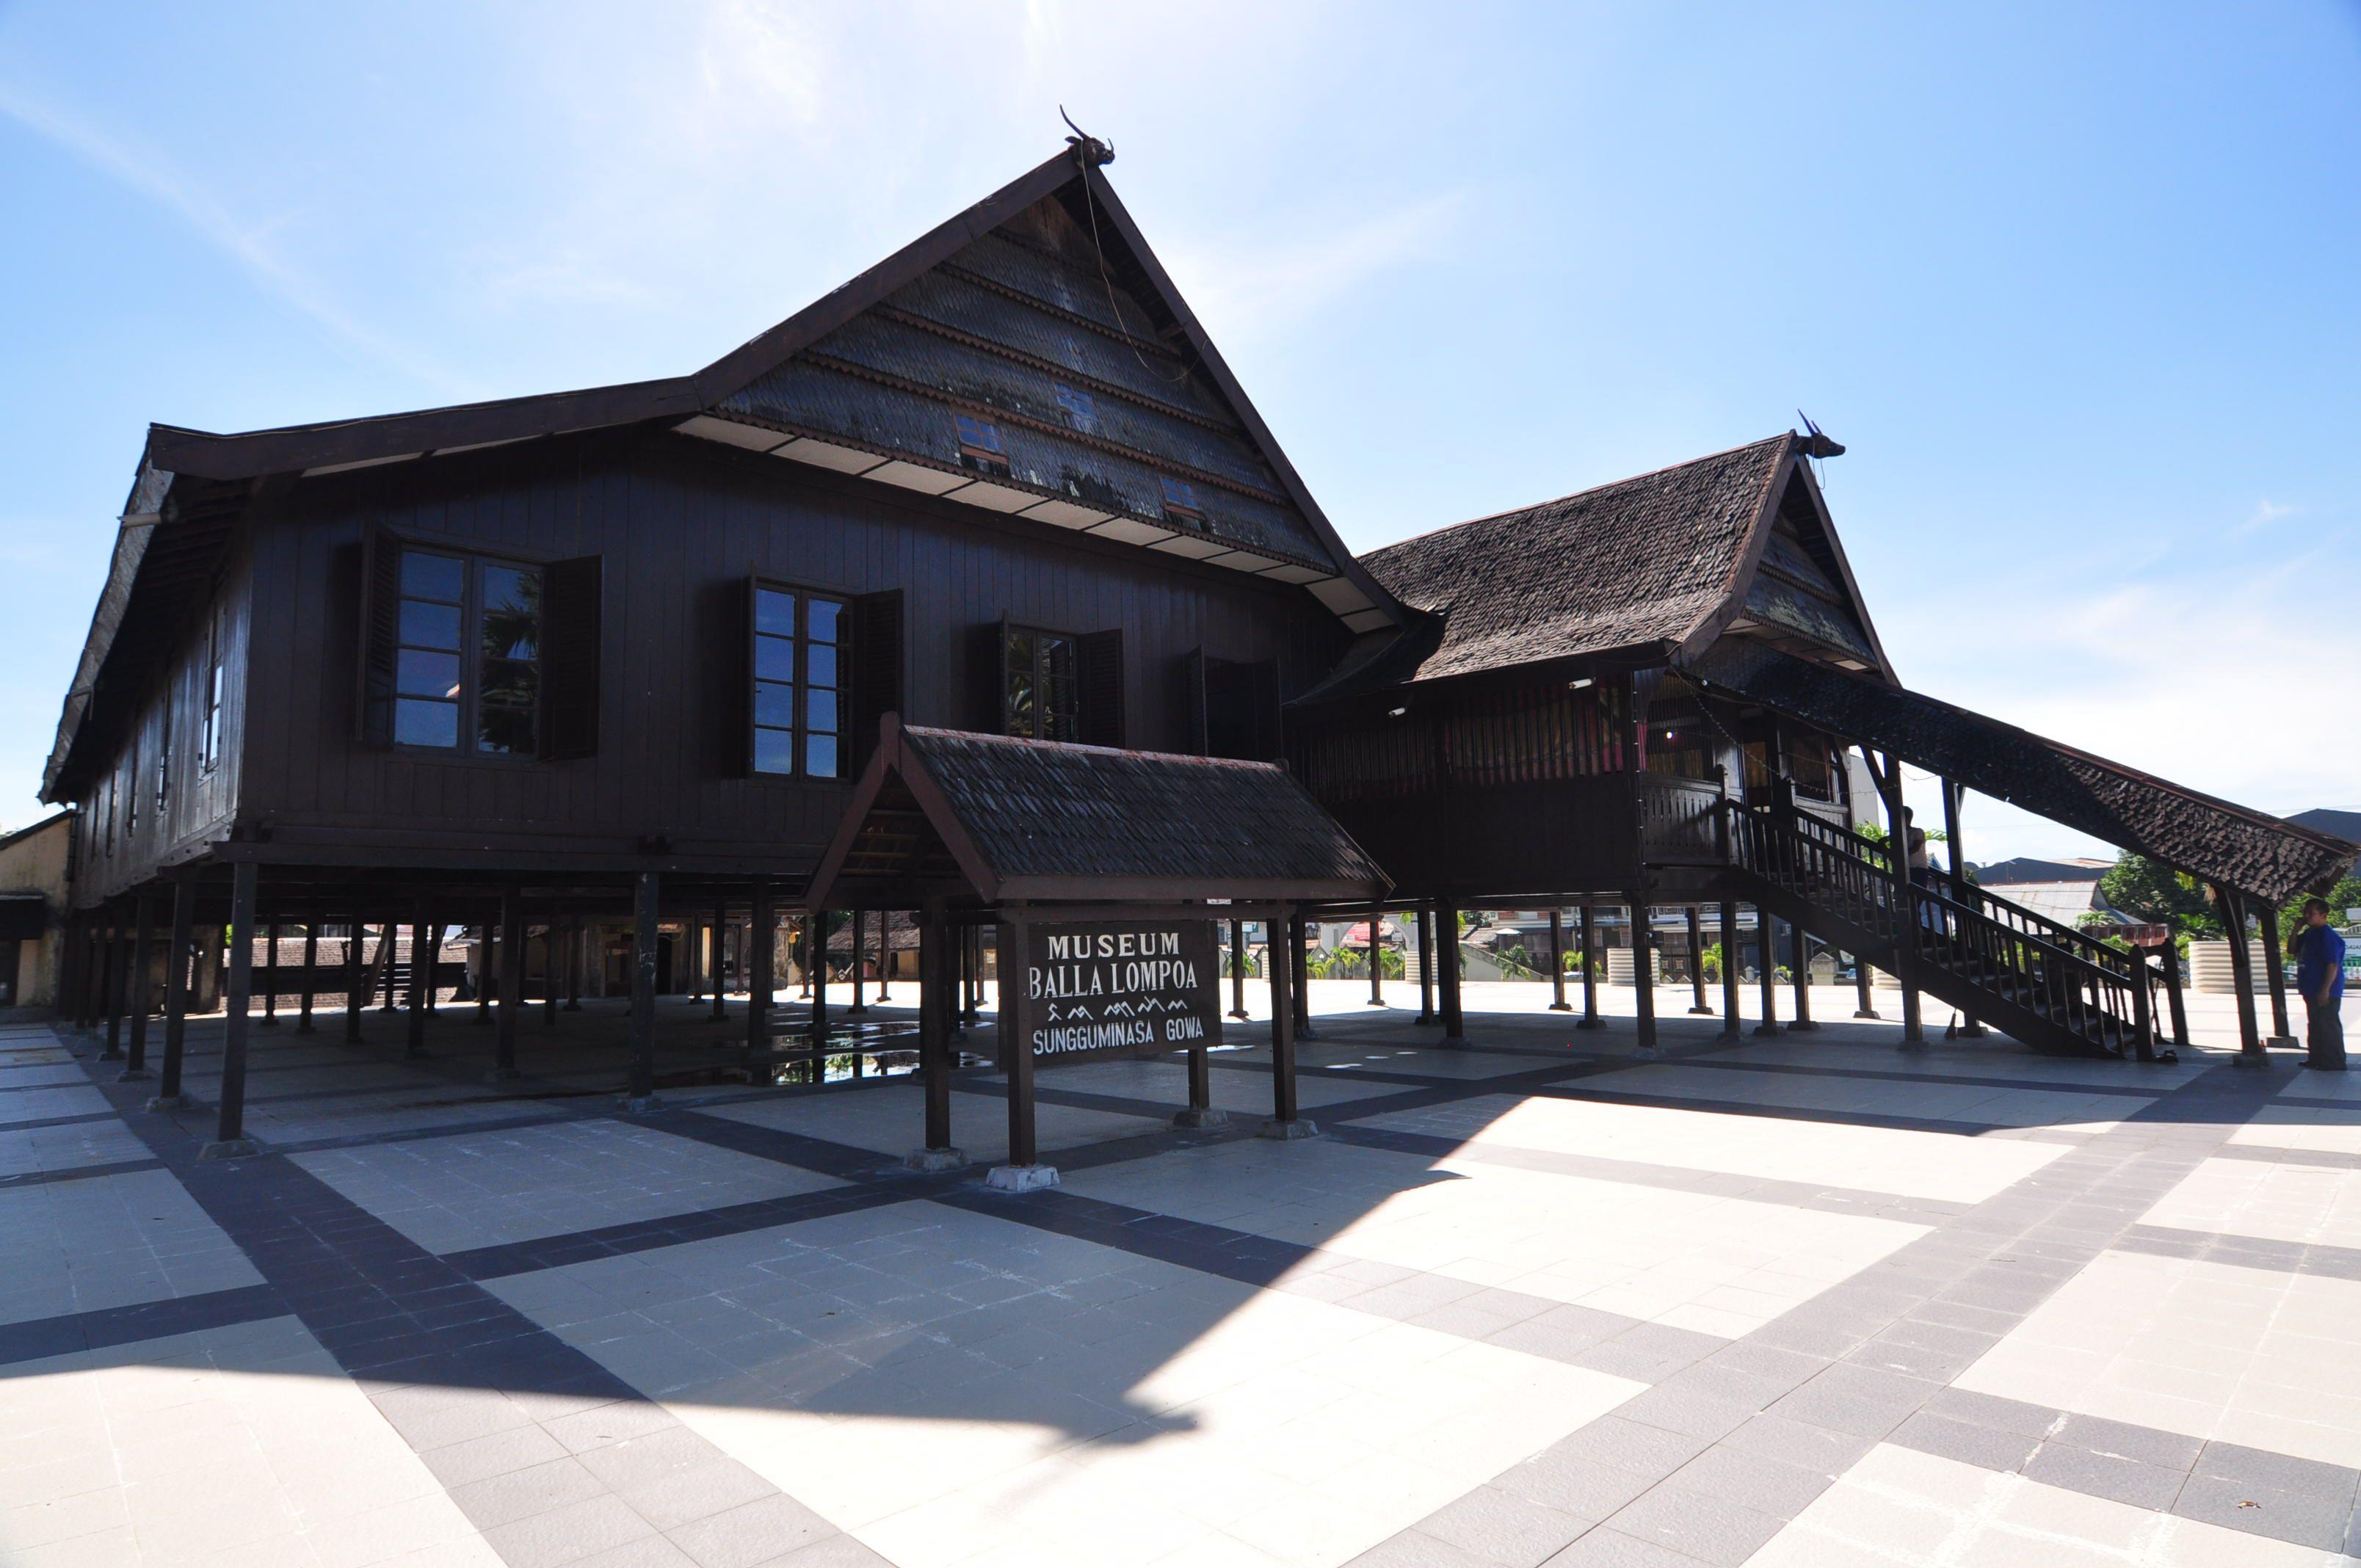 Kunjungi Museum Balla Lompoa Gowa Sulawesi Selatan Rekonstruksi Istana Raja